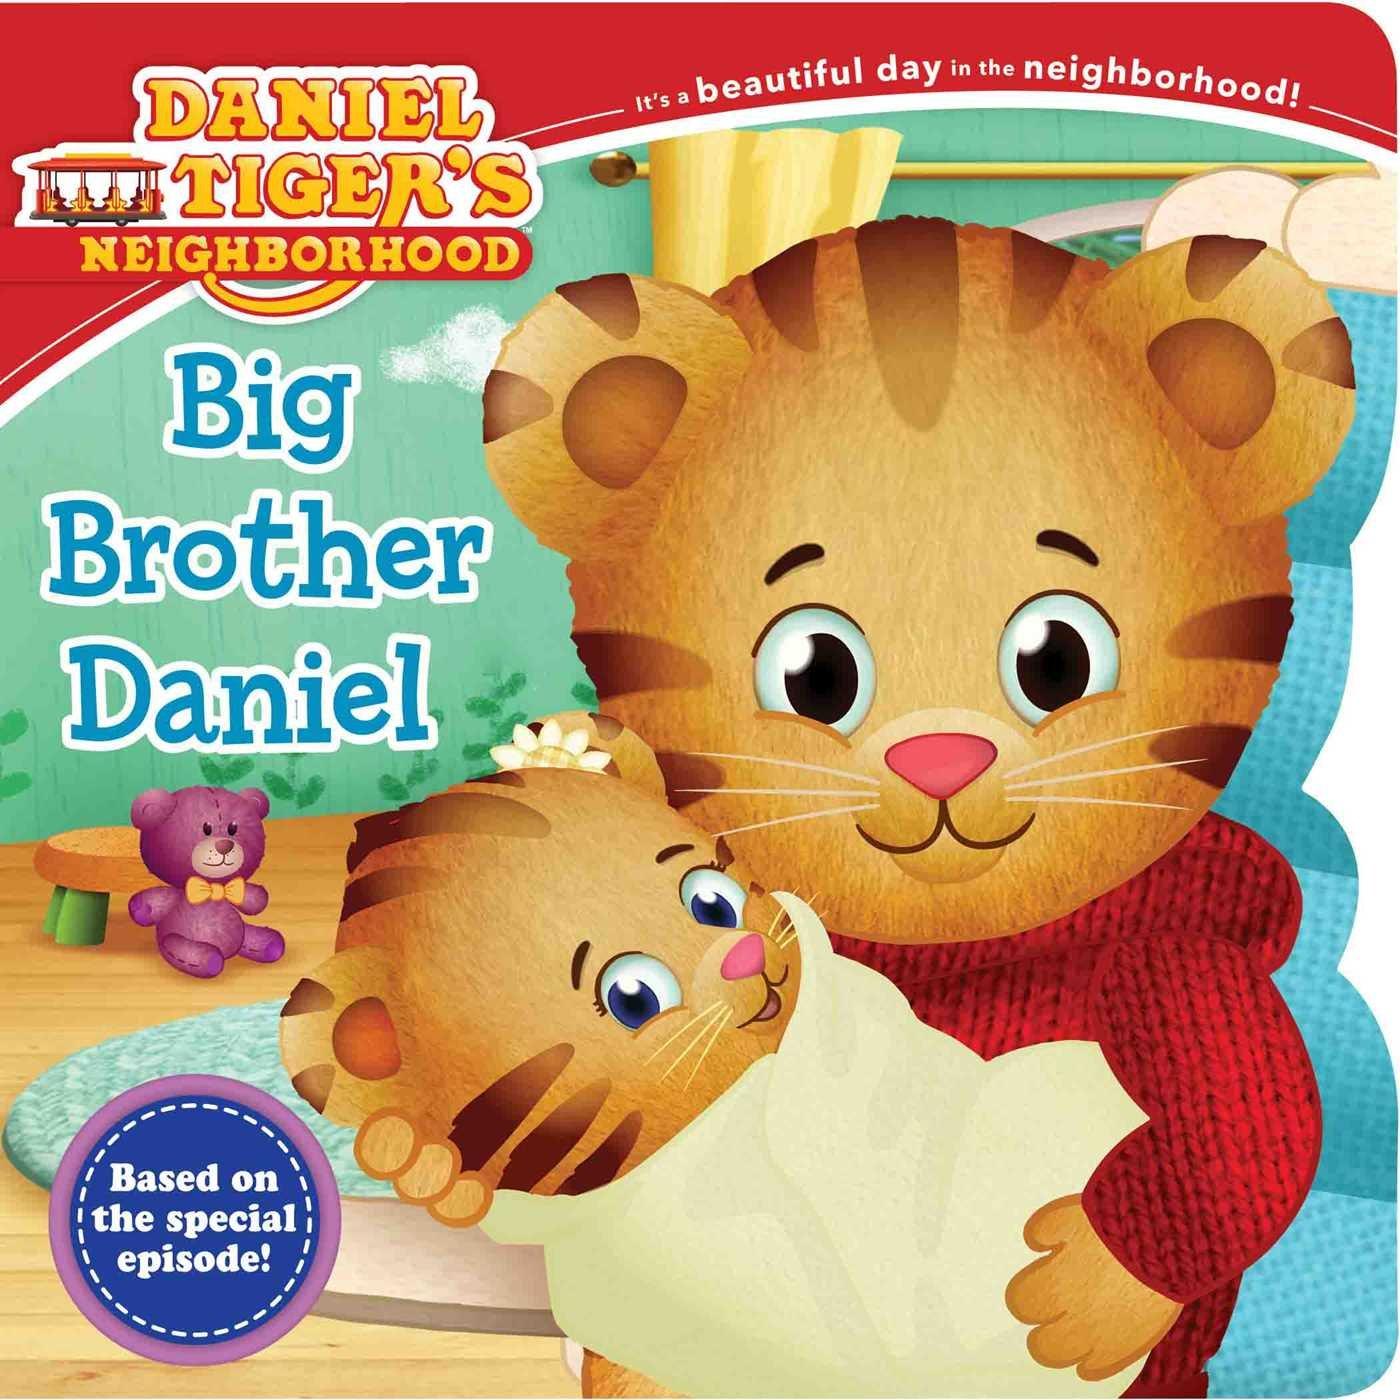 Big Brother Daniel by Angela C. Santomeero